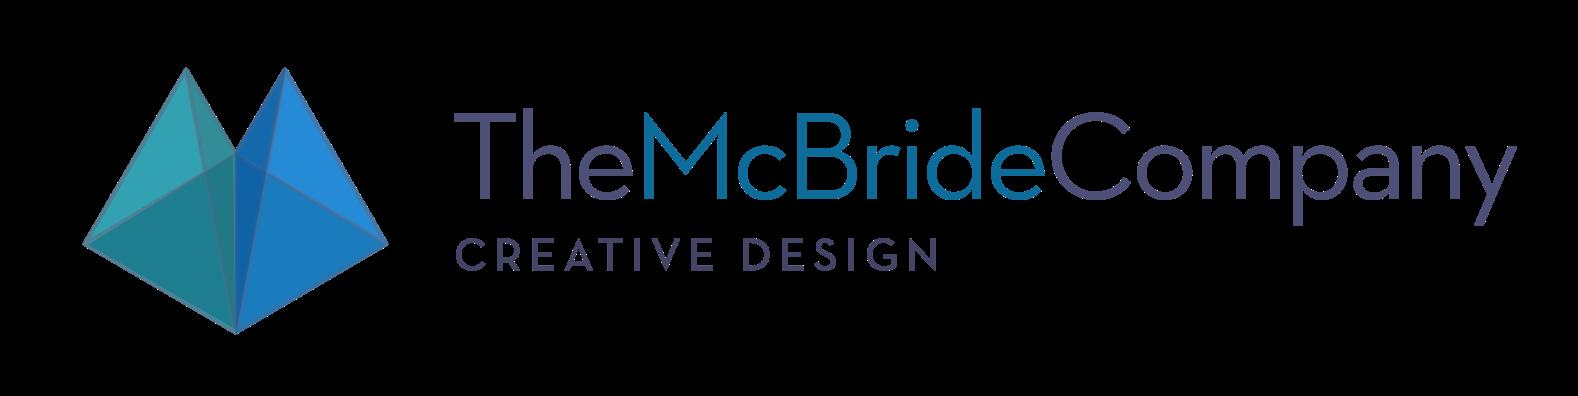 mcbride-logo-full.png